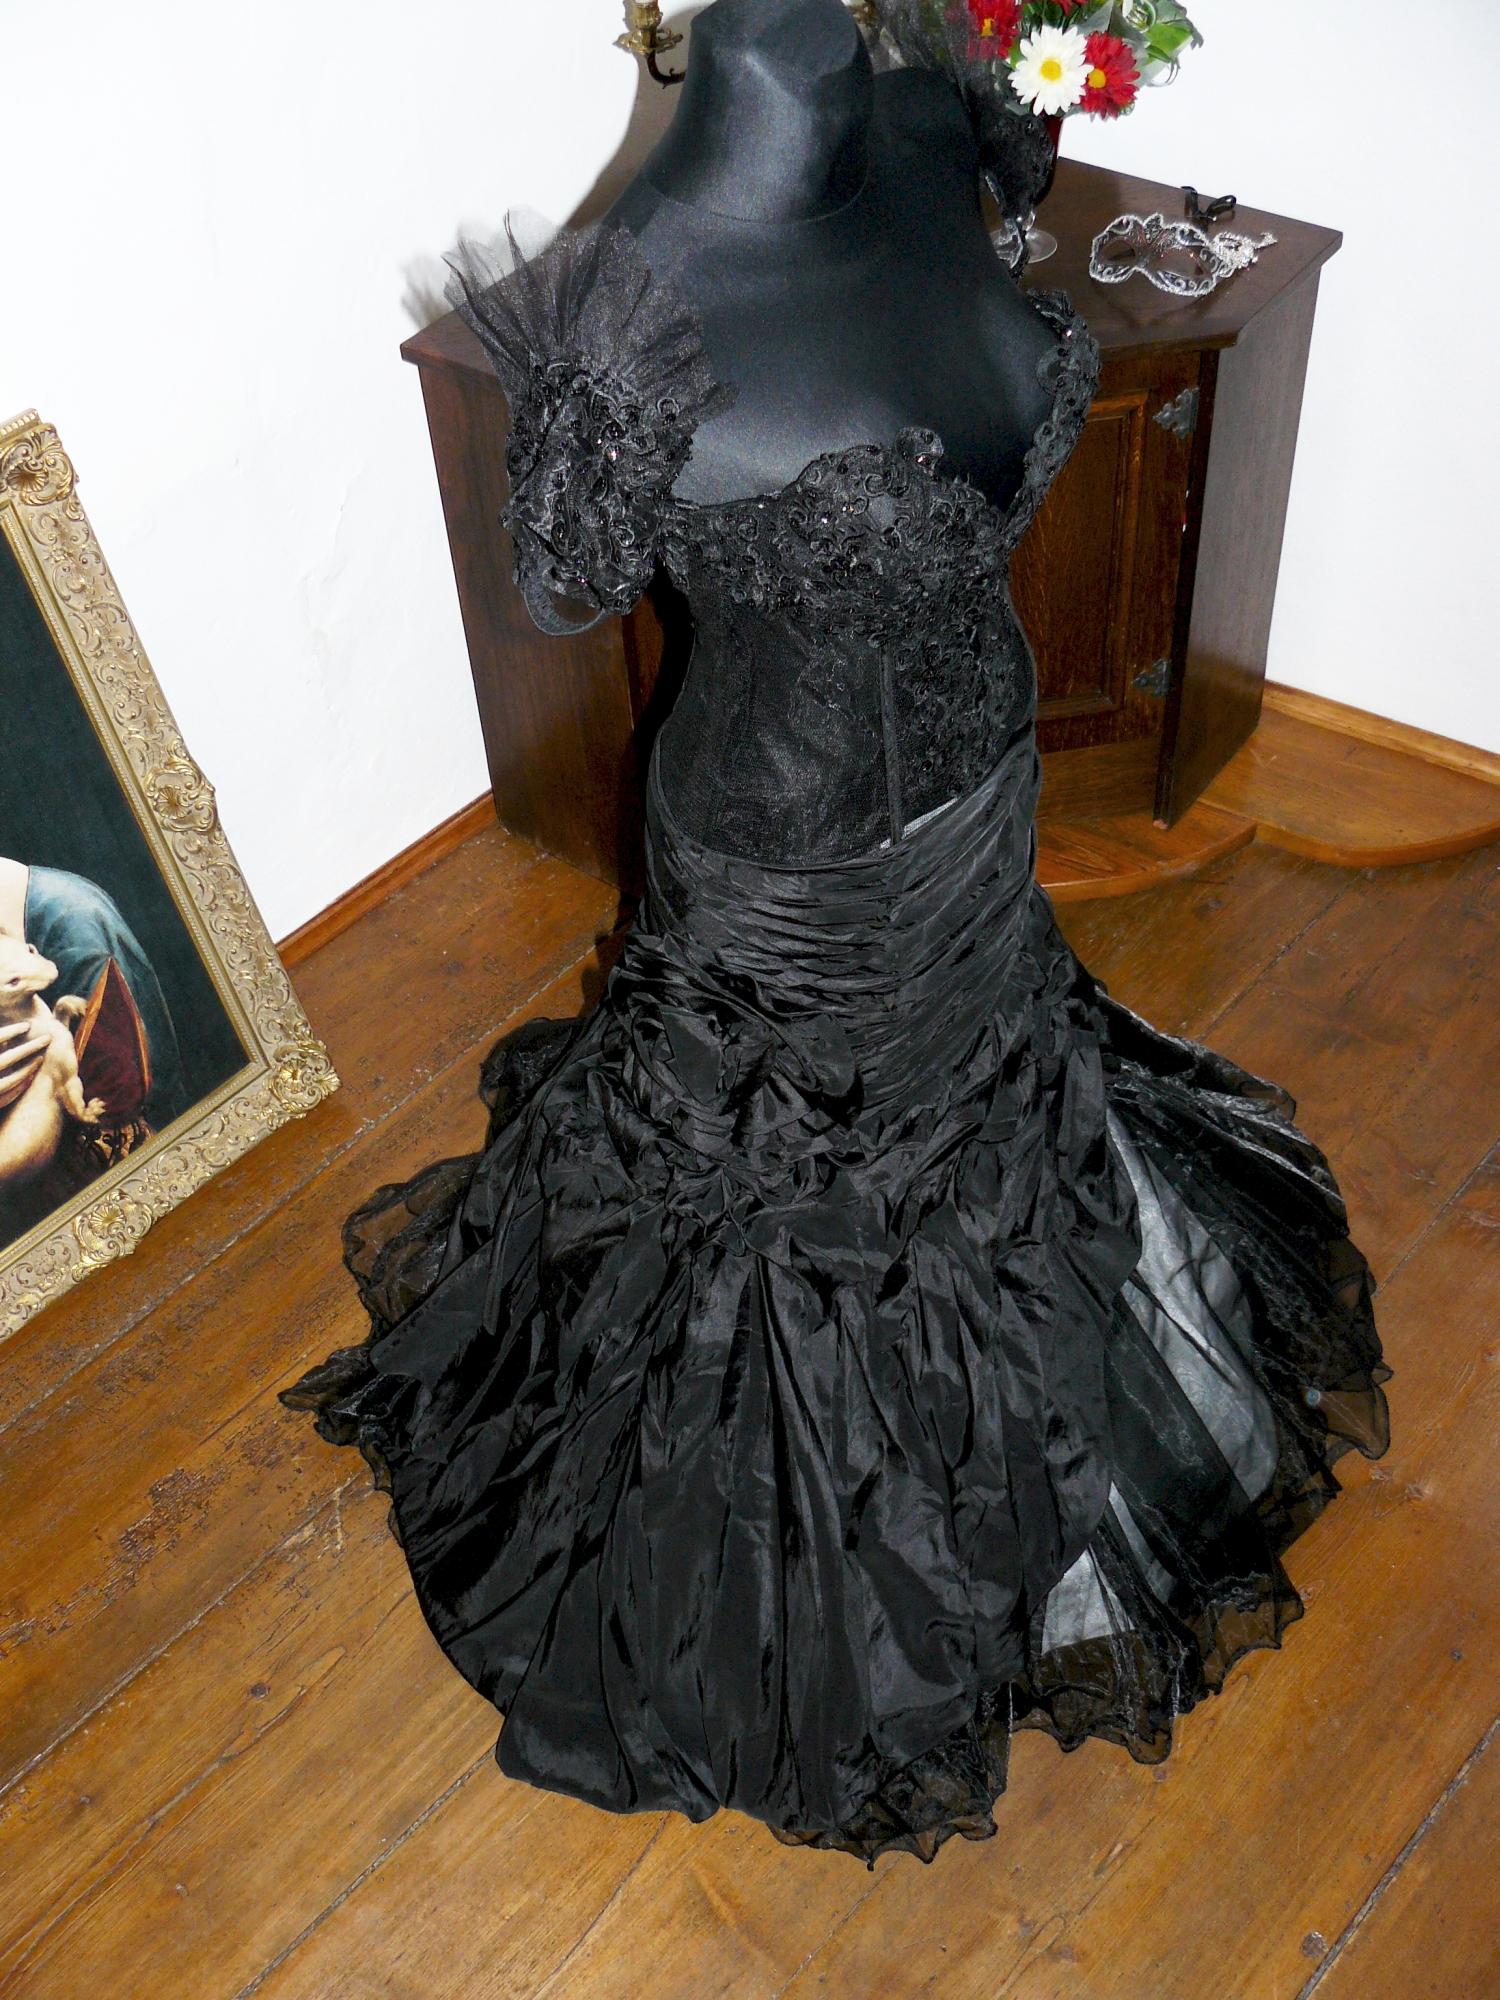 cc096c2f876 Vampire gothic plesové šaty na maturitní ples - plesové šaty ...